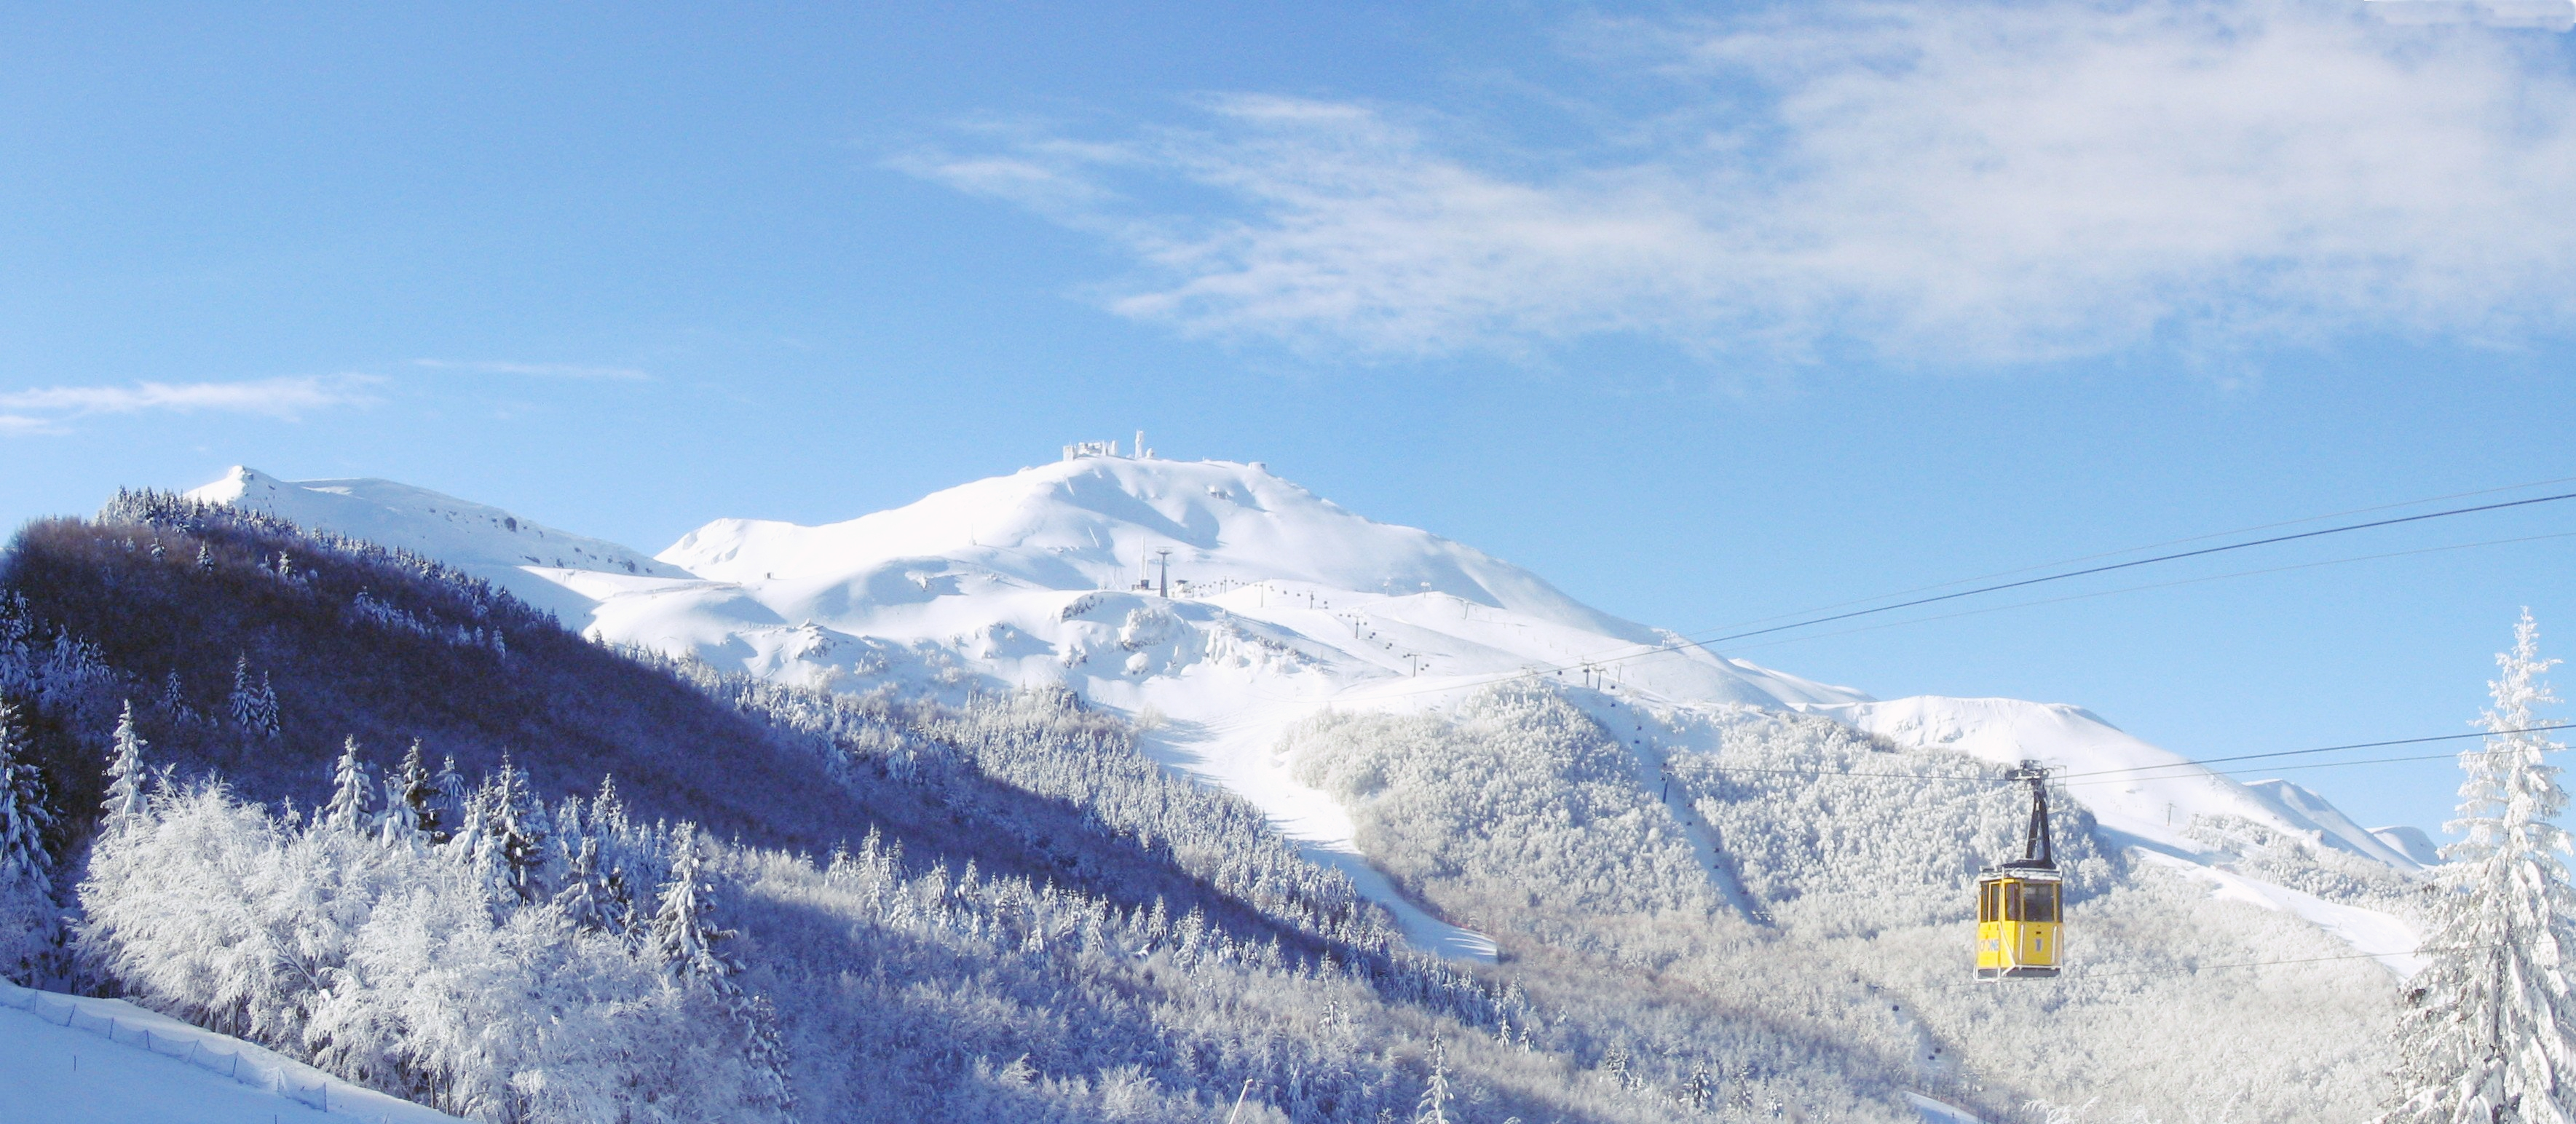 Cimone Mount-Apeninii Nordici